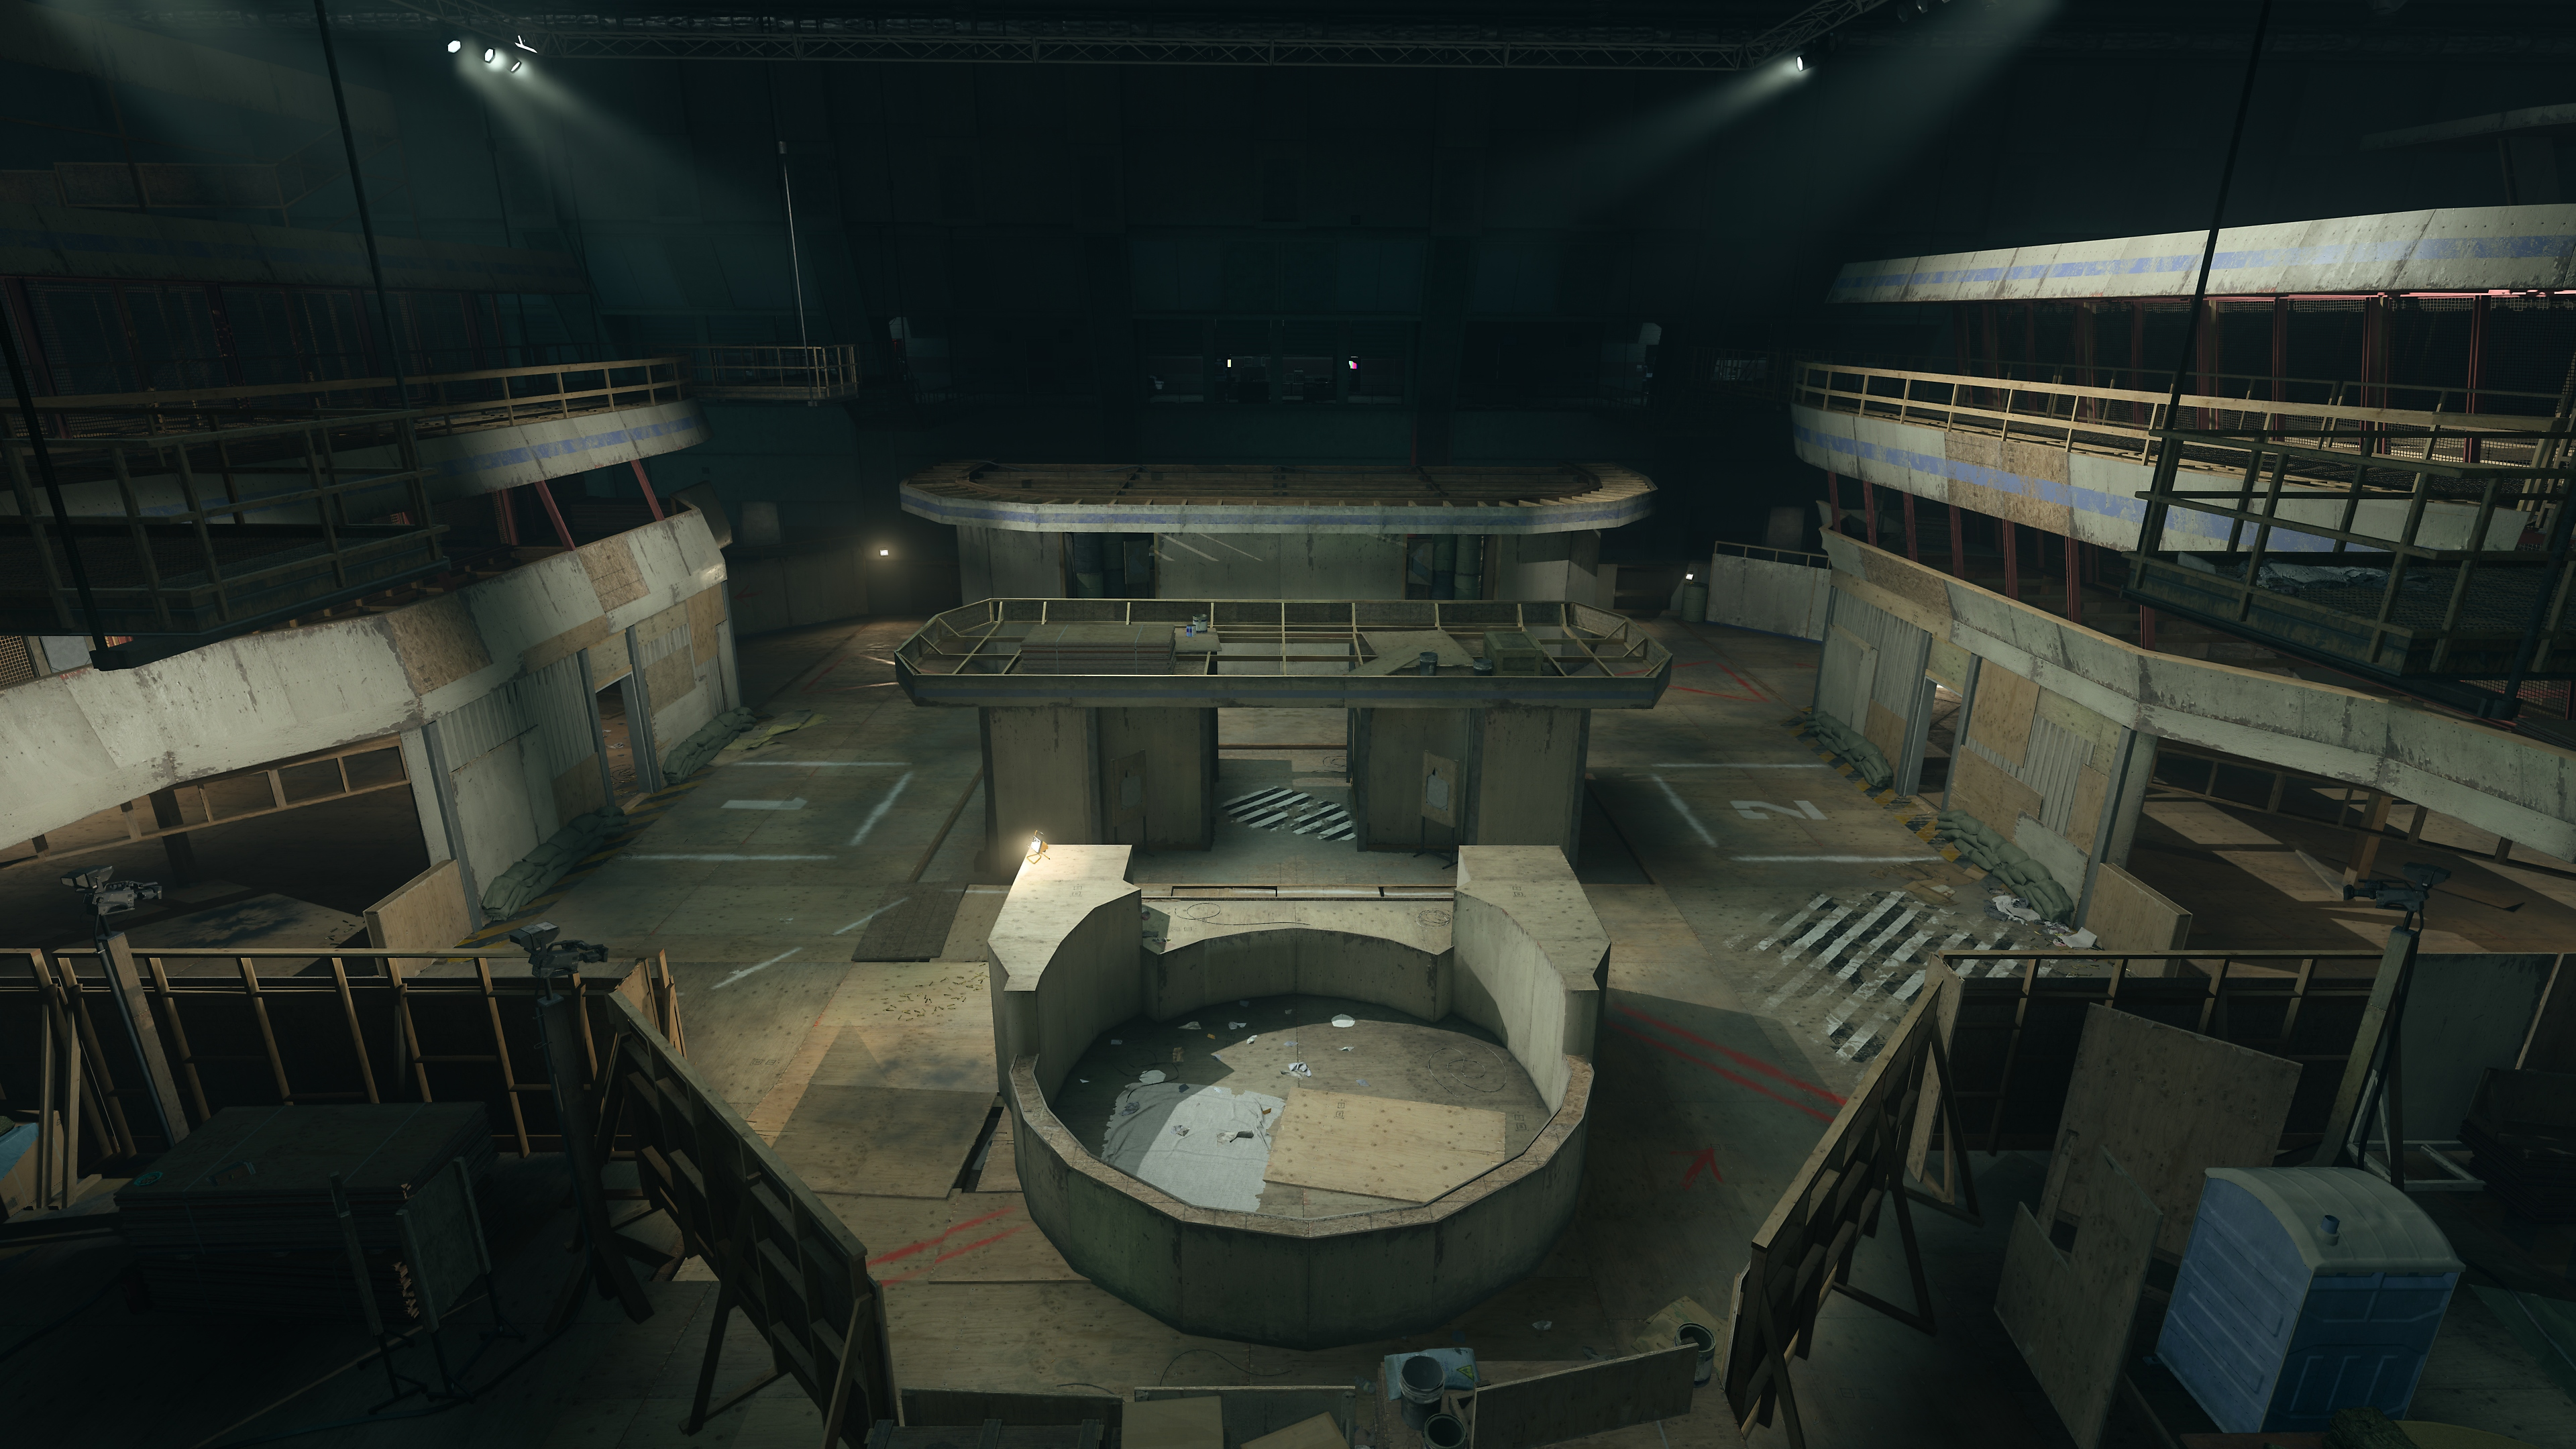 Call of Duty Warzone gulag screenshot